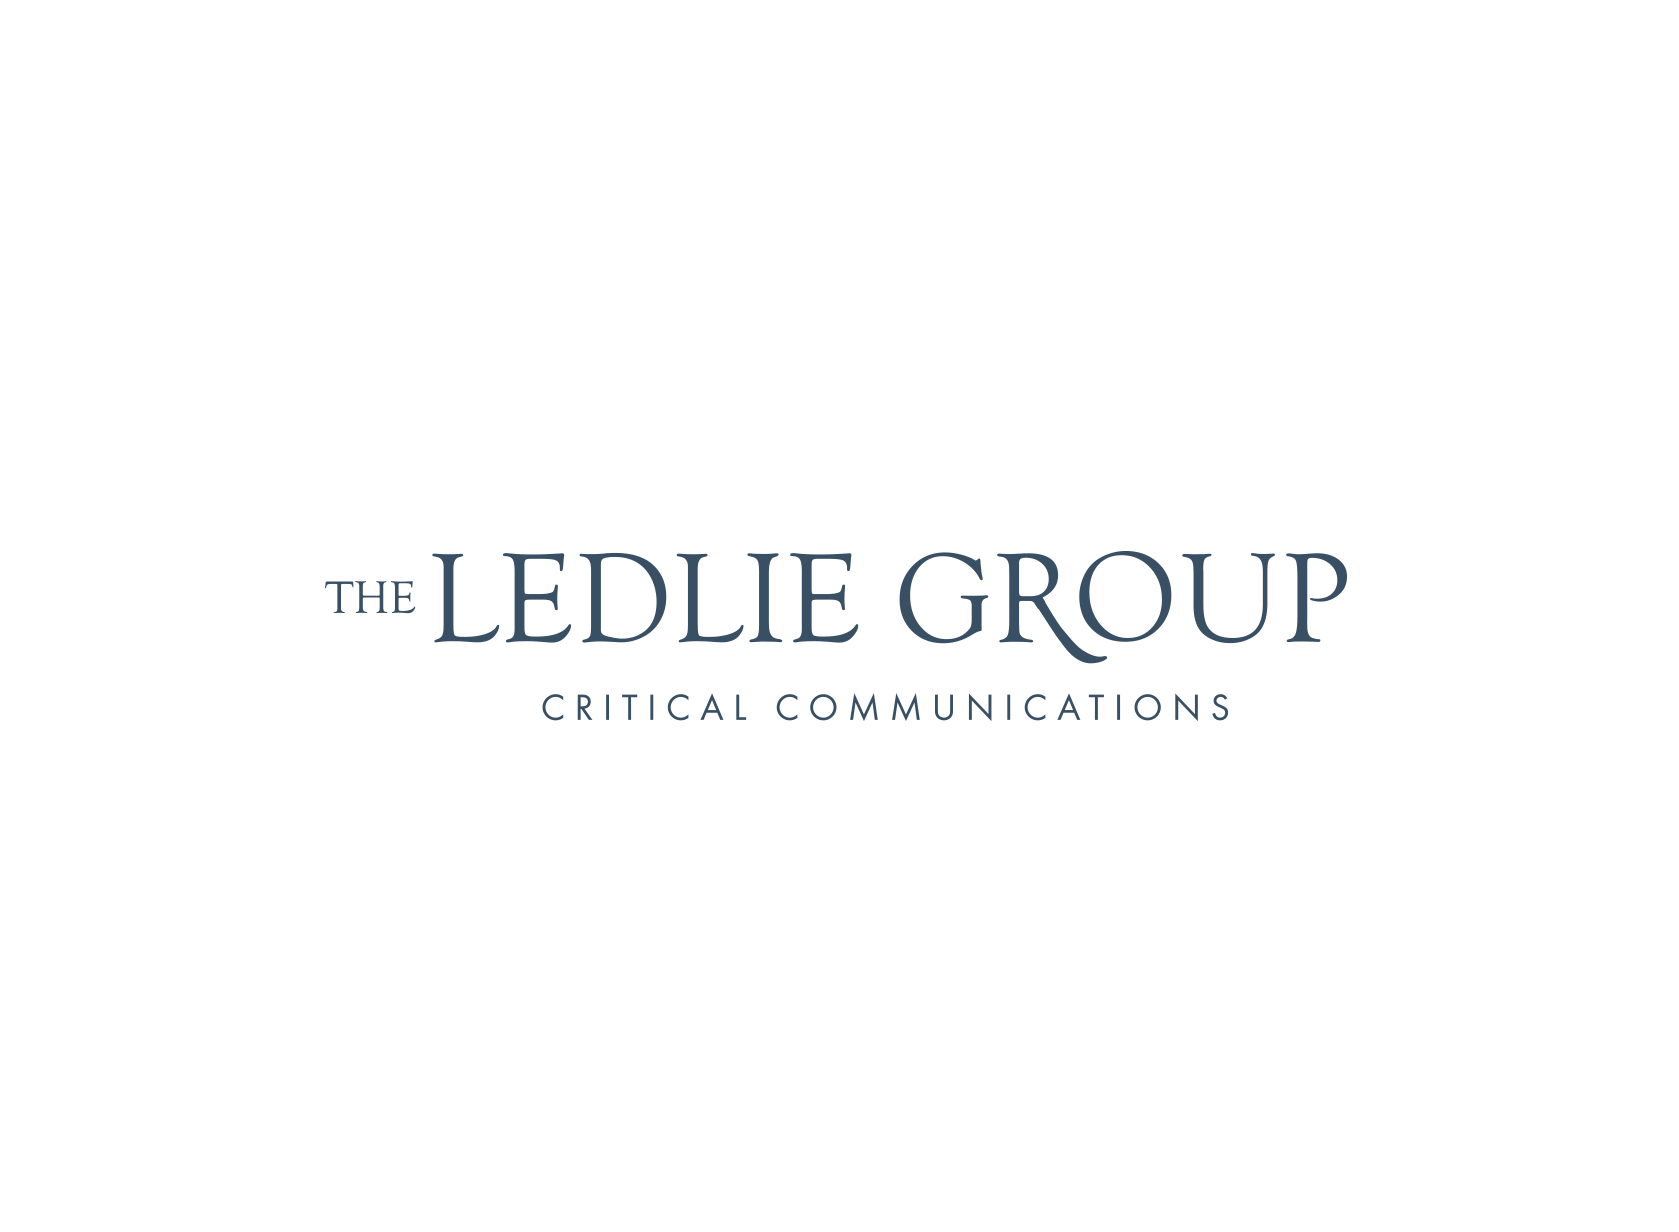 Ledlie_Grop_1679x1232